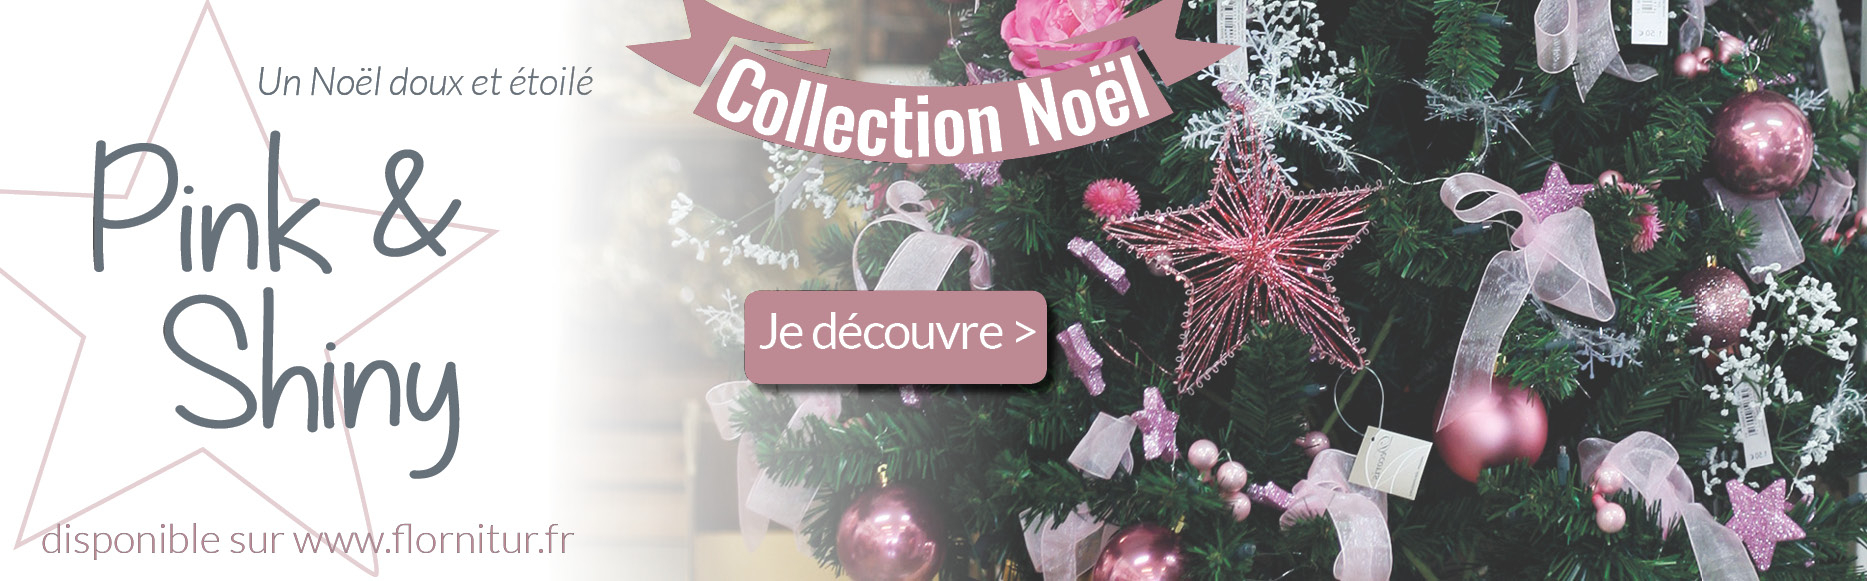 Noël Flornitur Collection Pinki